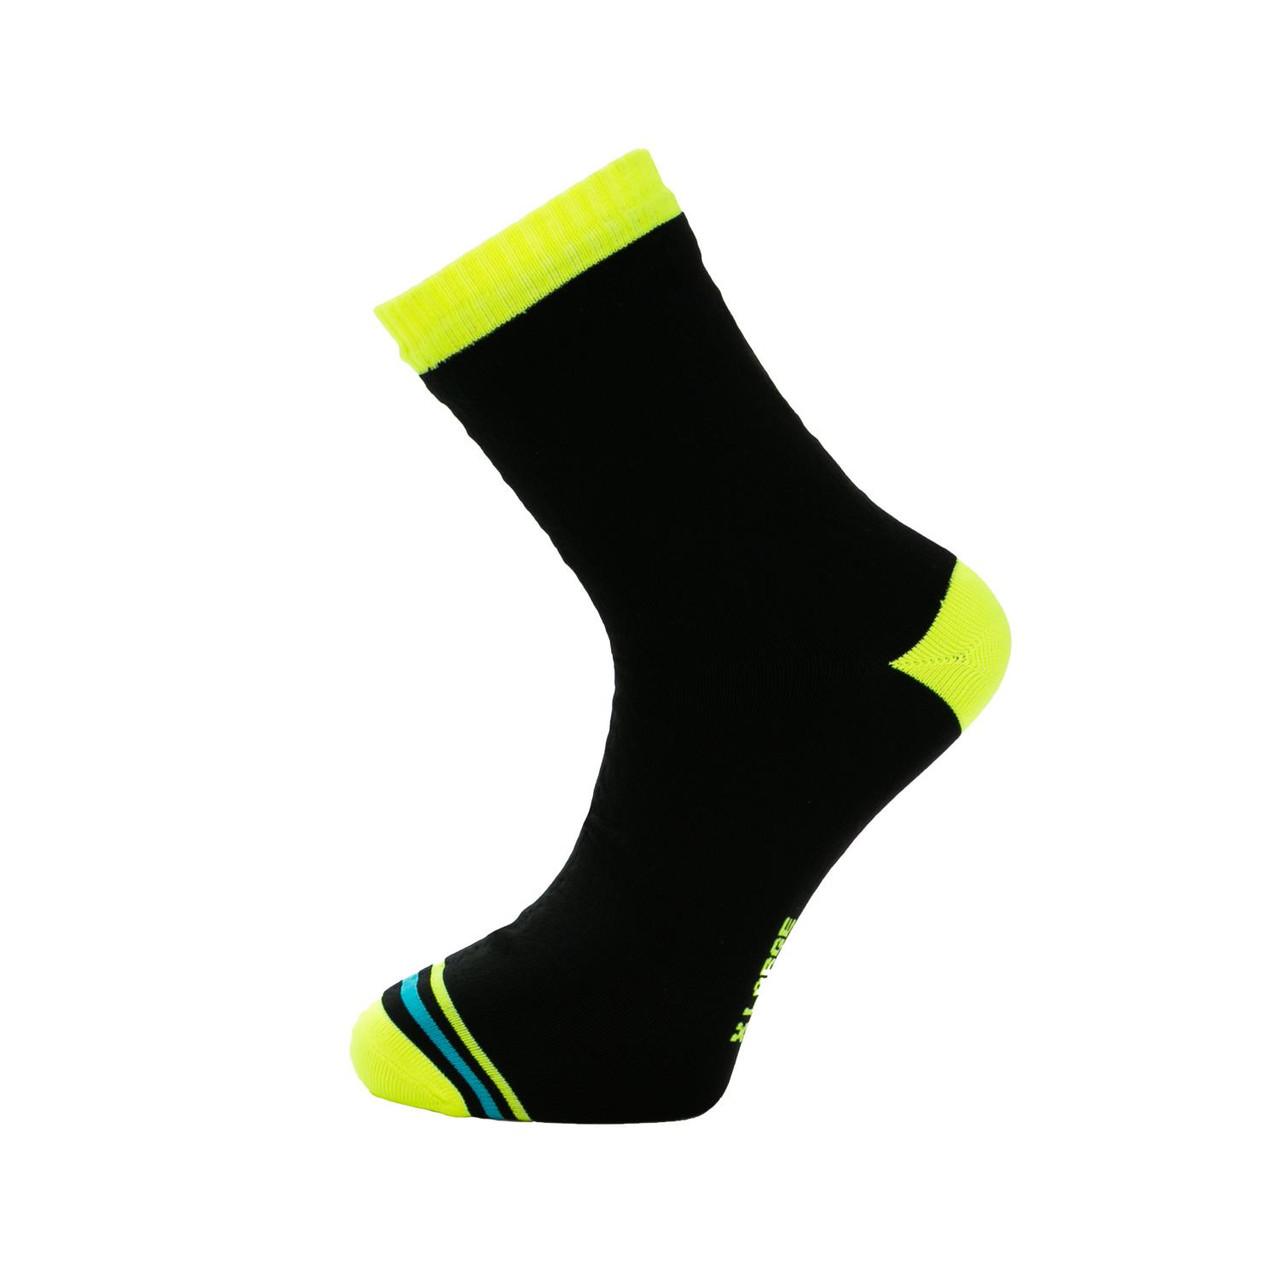 Dexshell Ultralite Biking Sock (Small)